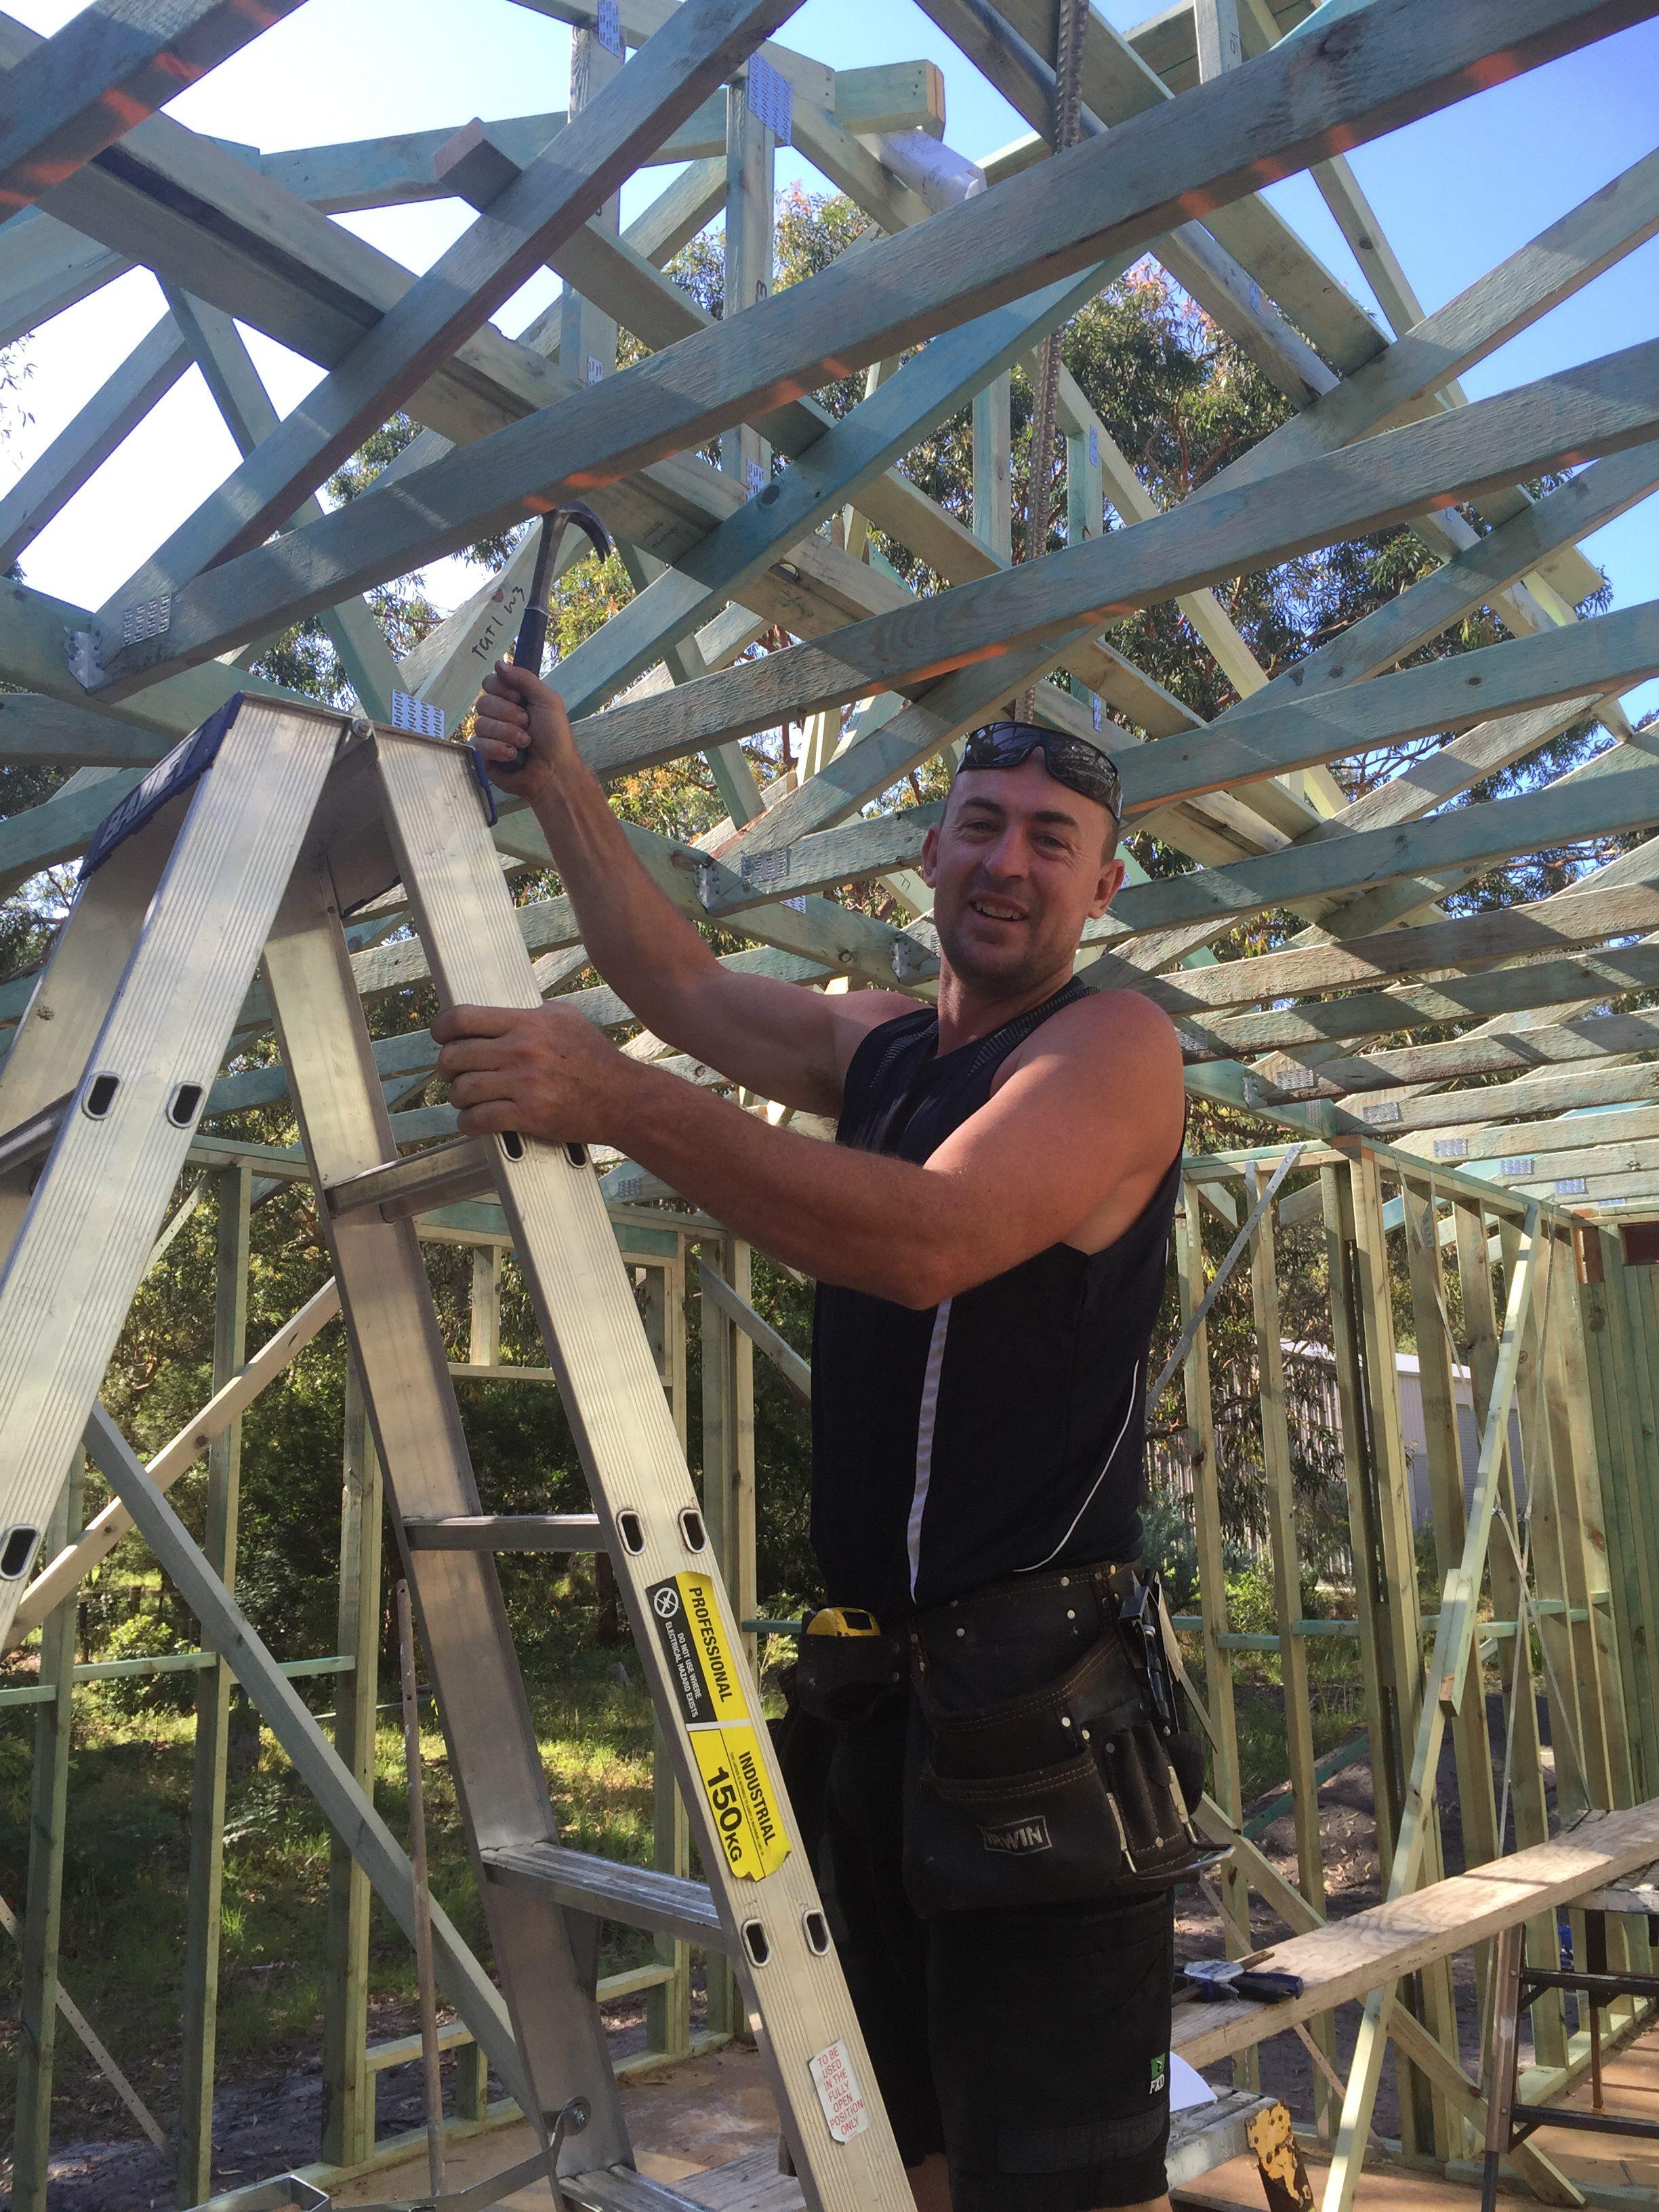 Anna Bay builder Todd O'Leary. Photo by Jo Finn